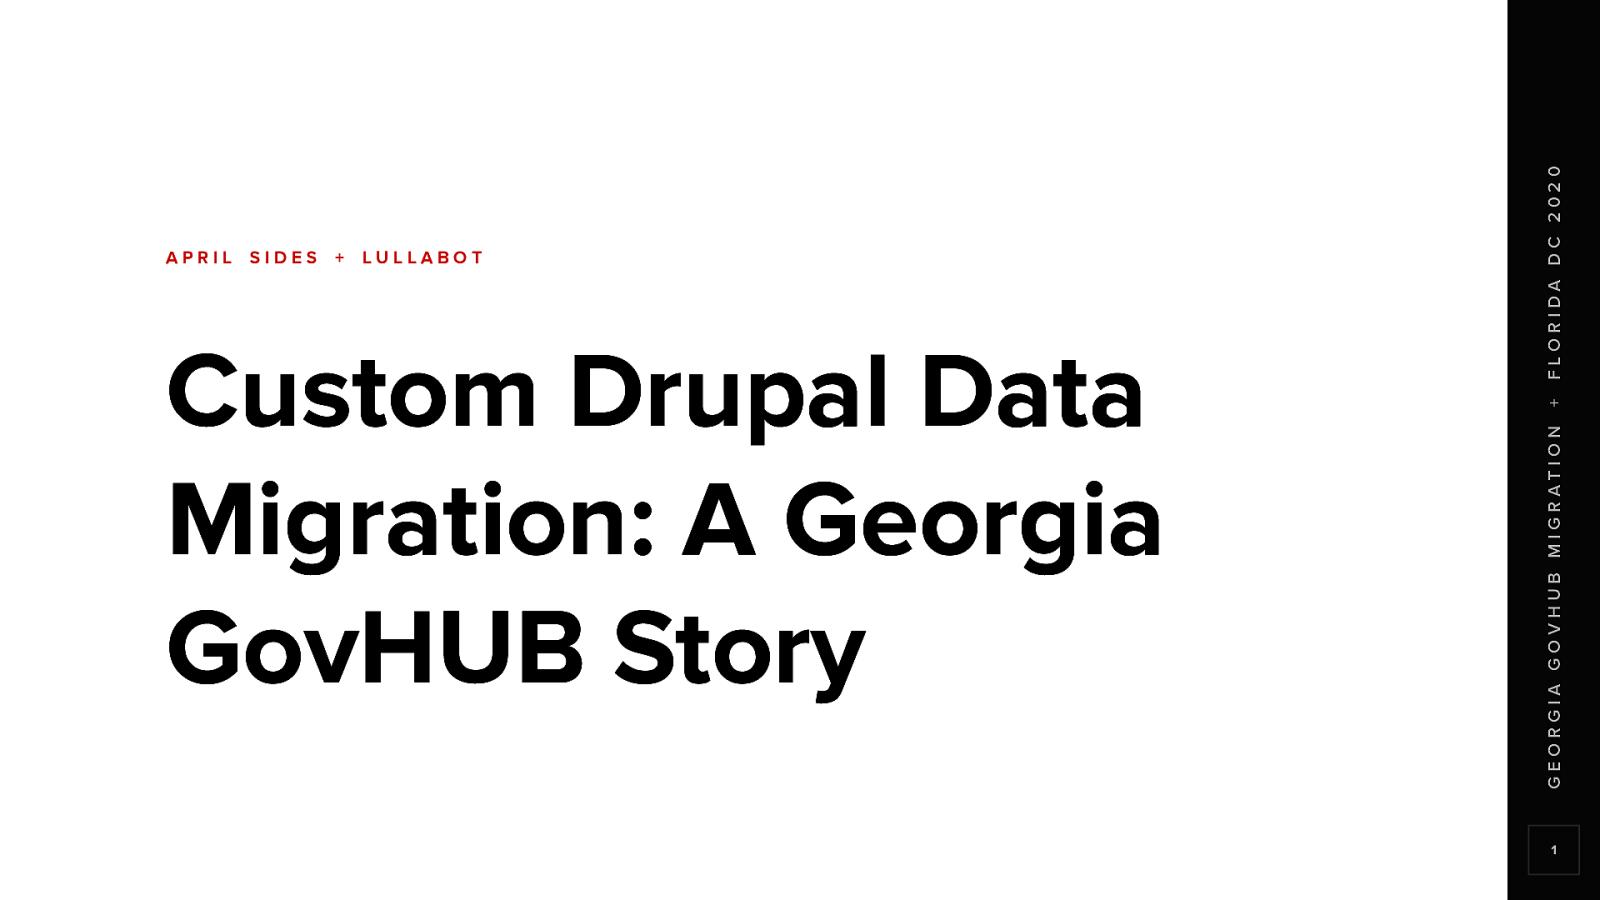 Custom Drupal Data Migration: A Georgia GovHUB Story